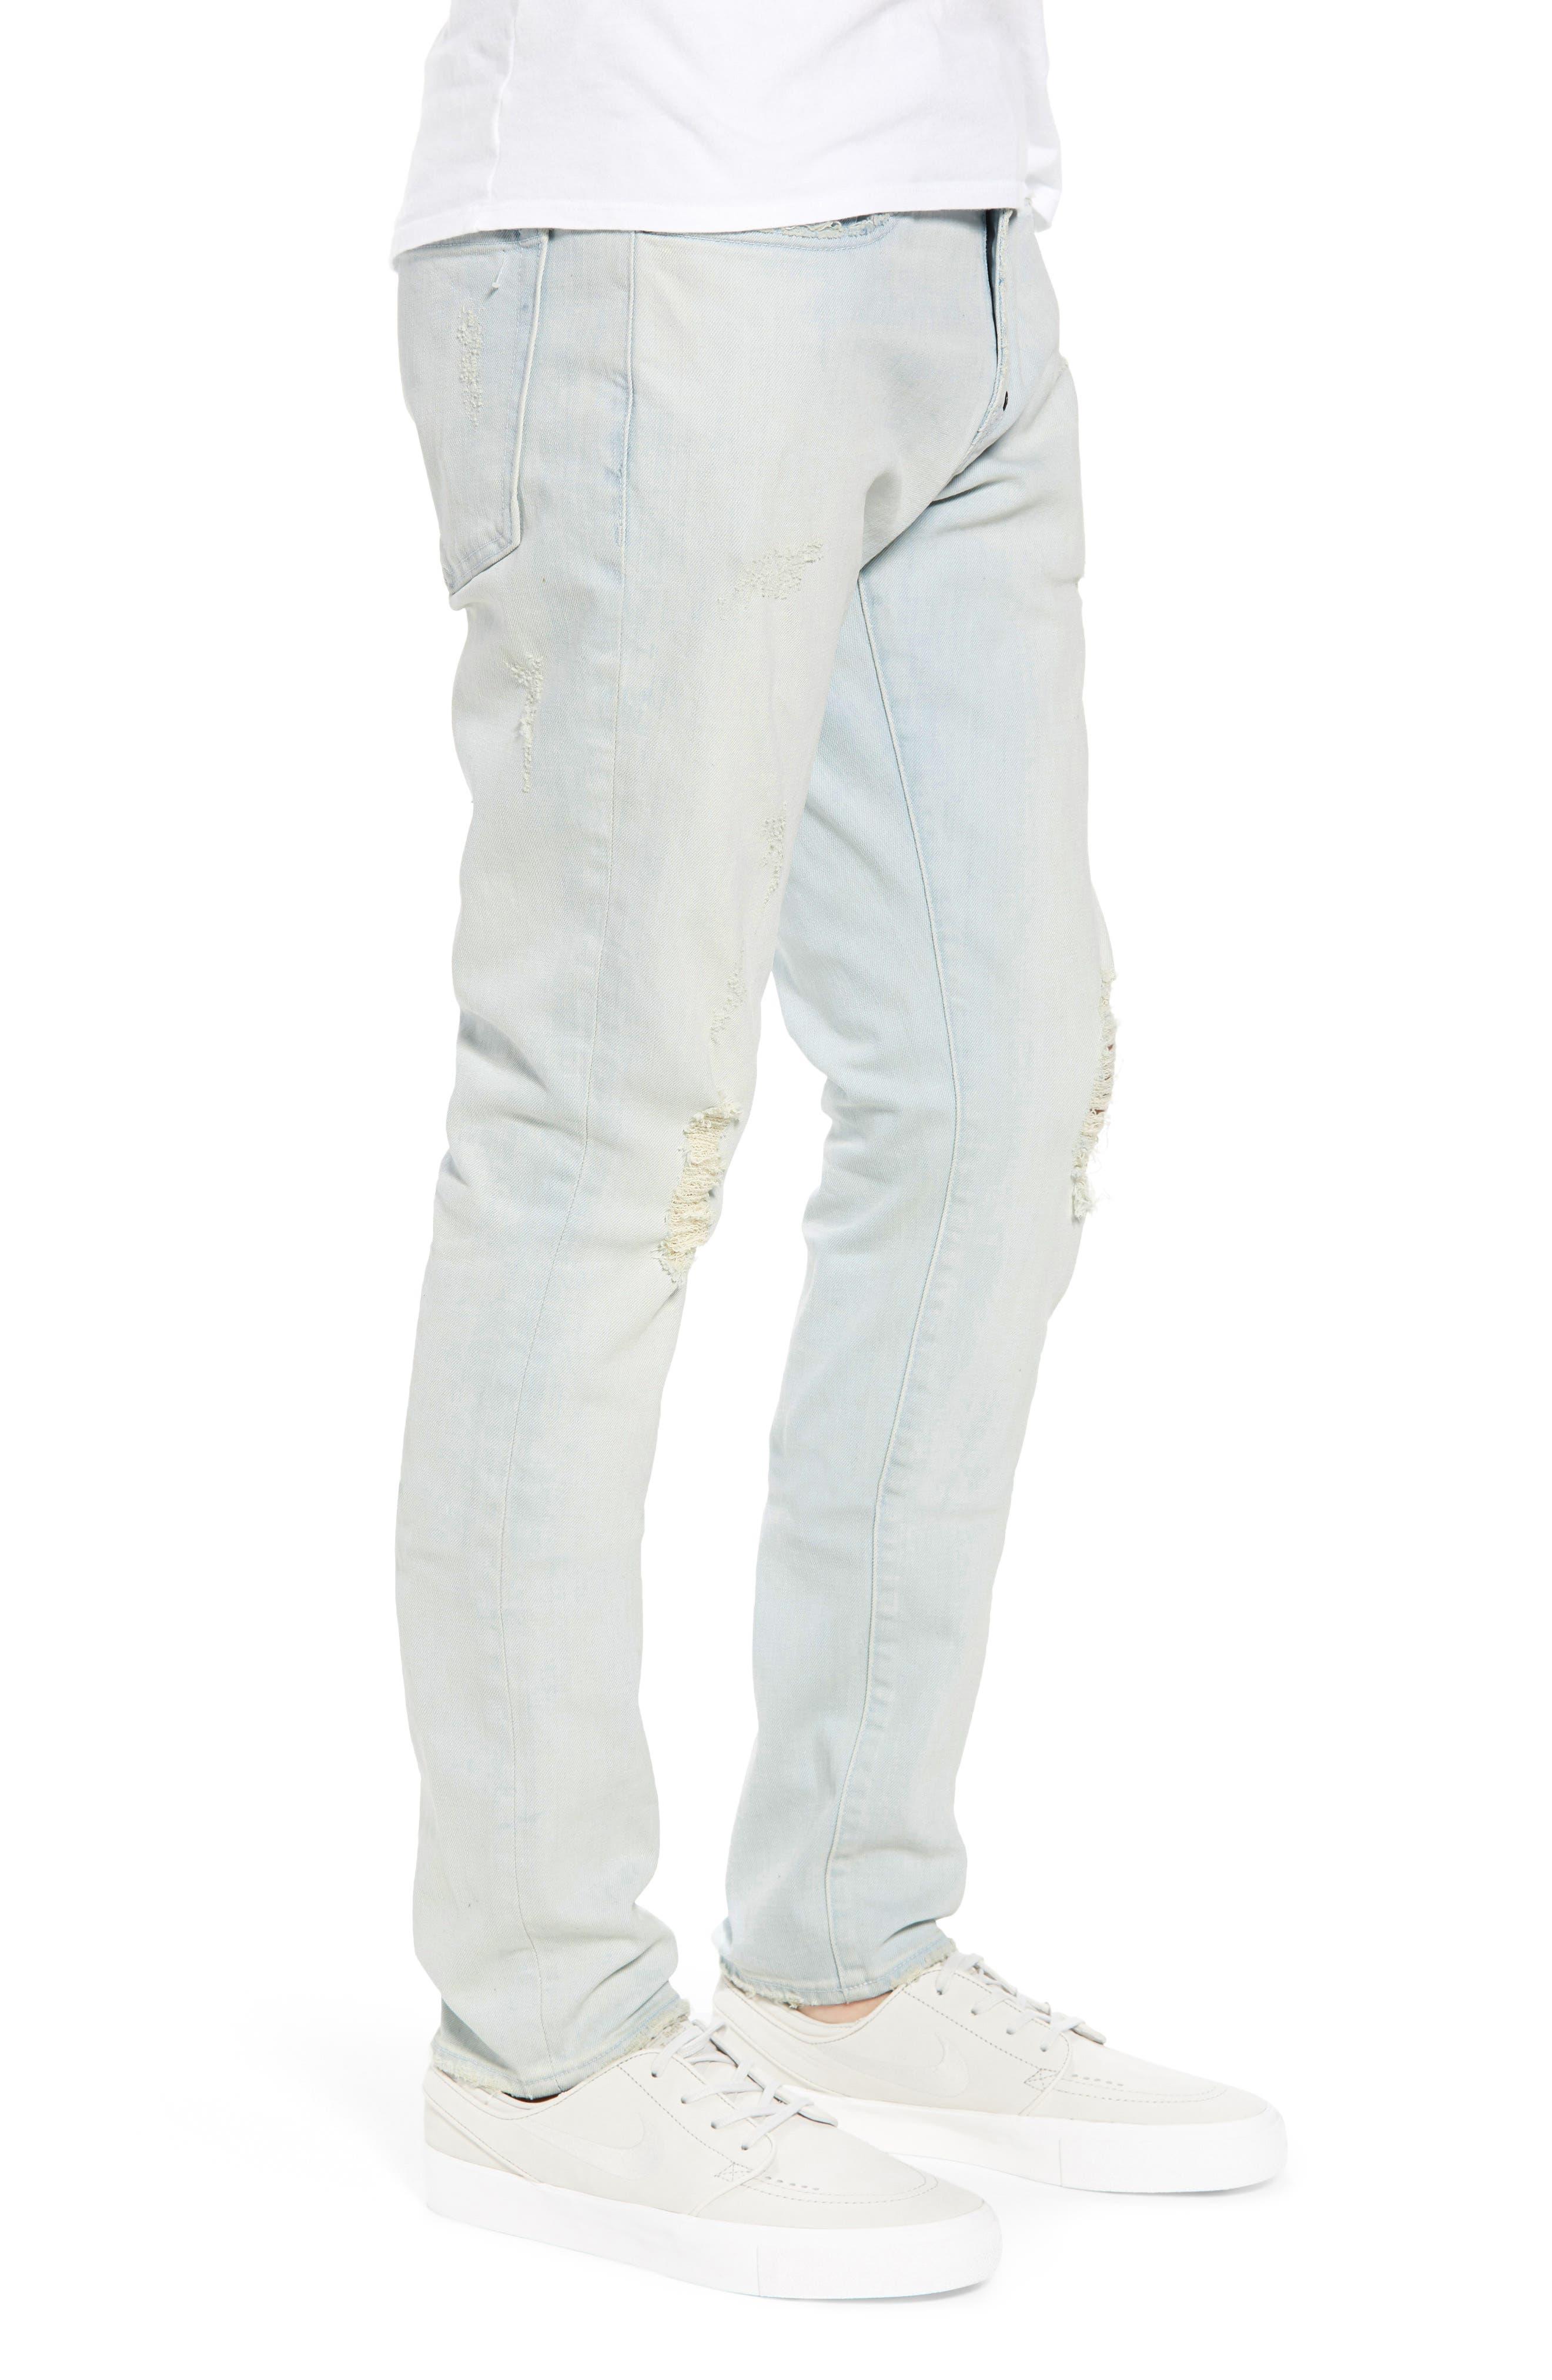 Windsor Slim Fit Jeans,                             Alternate thumbnail 3, color,                             Blue